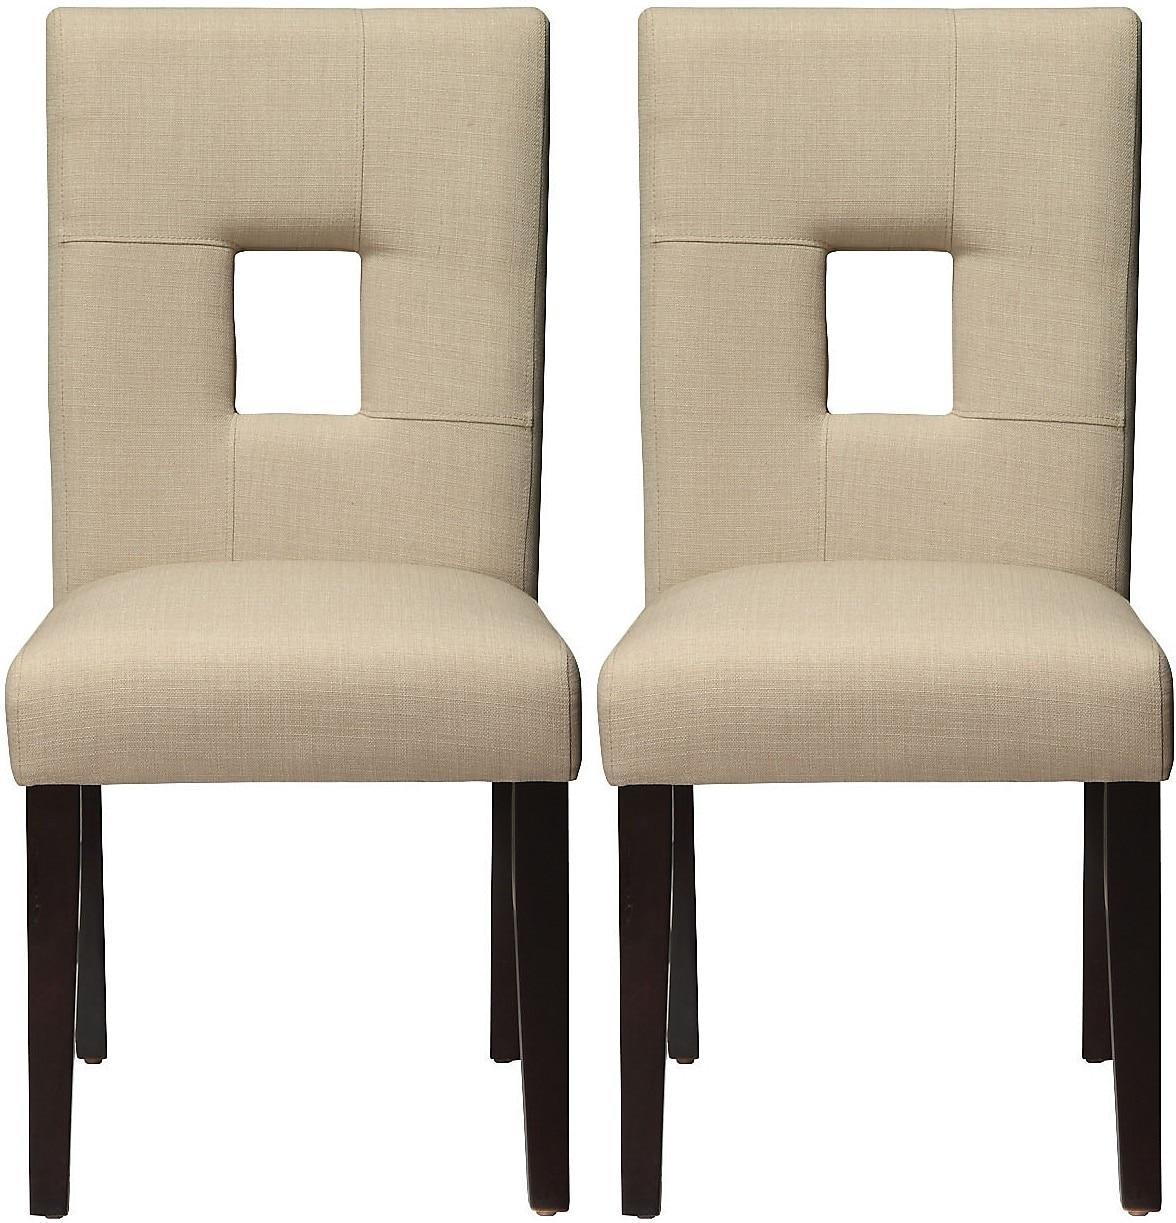 McKena 2-Pack Linen Dining Chair – Beige